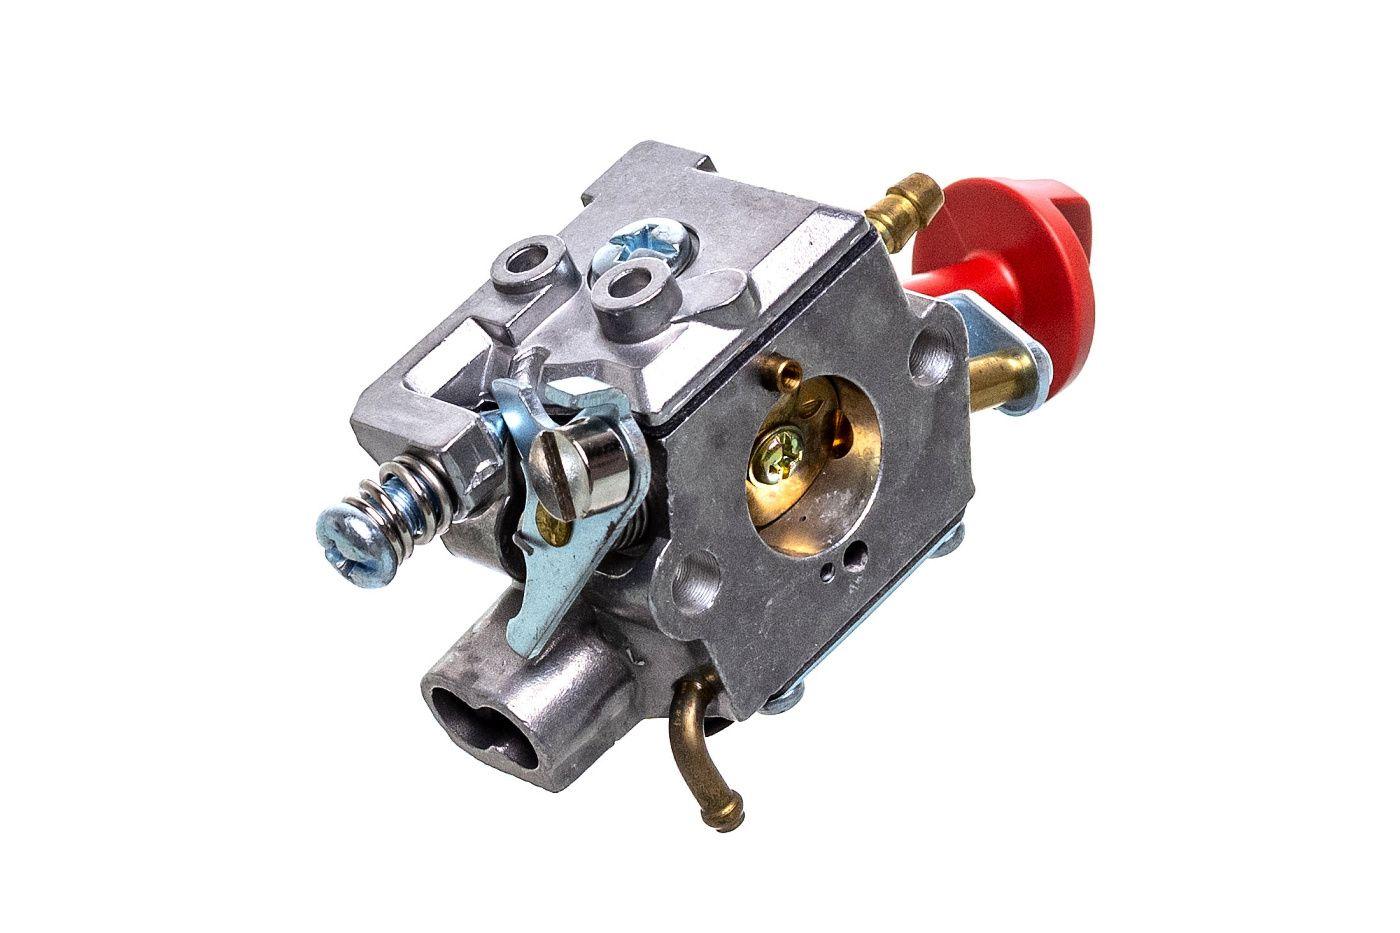 Karburátor Husqvarna 543 543XP 543XPG - 588848901